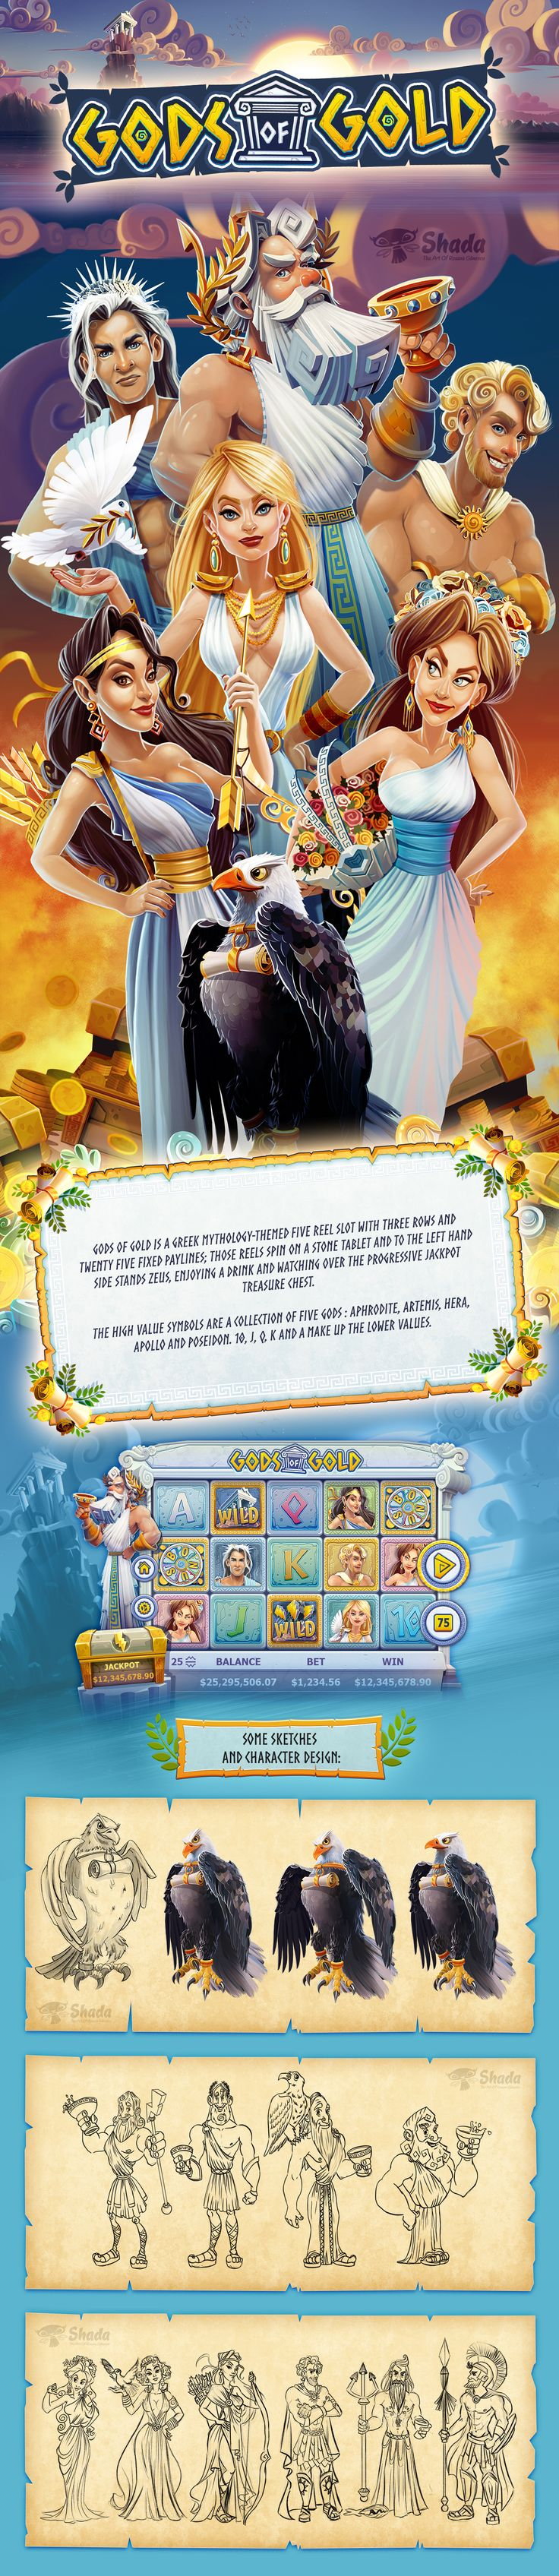 GODS OF GOLD videoslots game on Behance